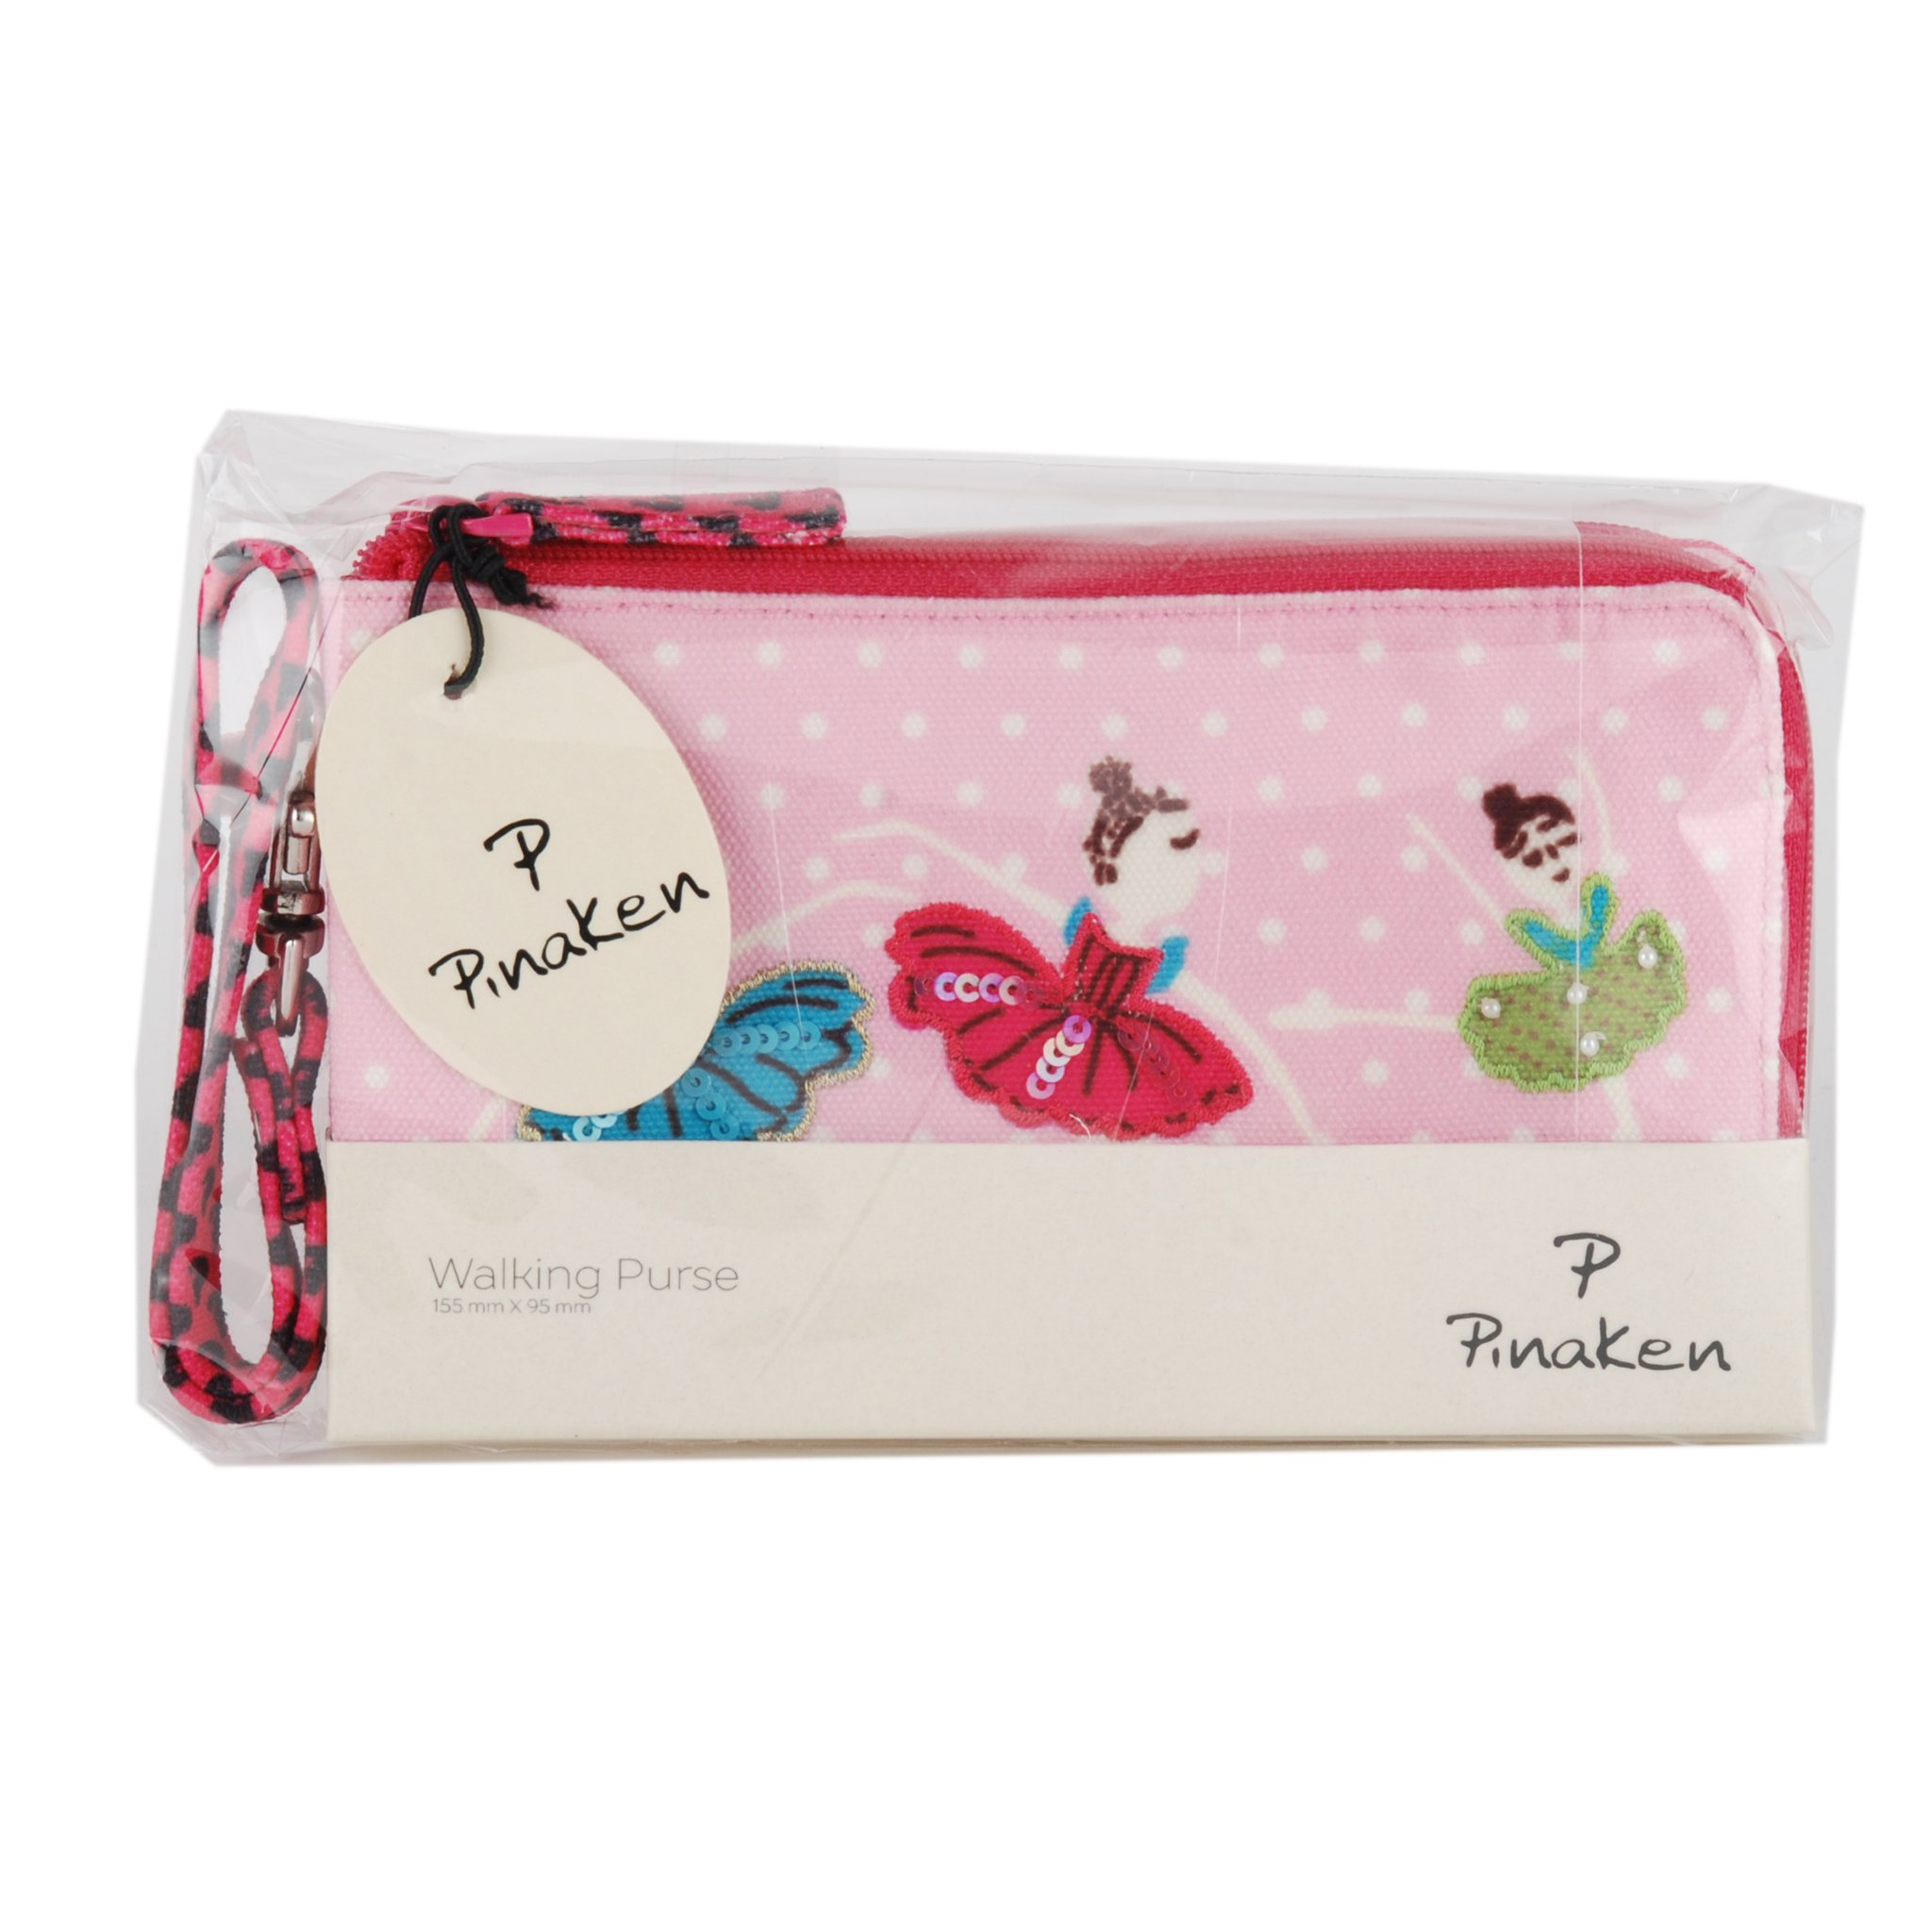 Wristlet removable clutch travel bag purse money pouch wallet organizer by Pinaken (Image #4)